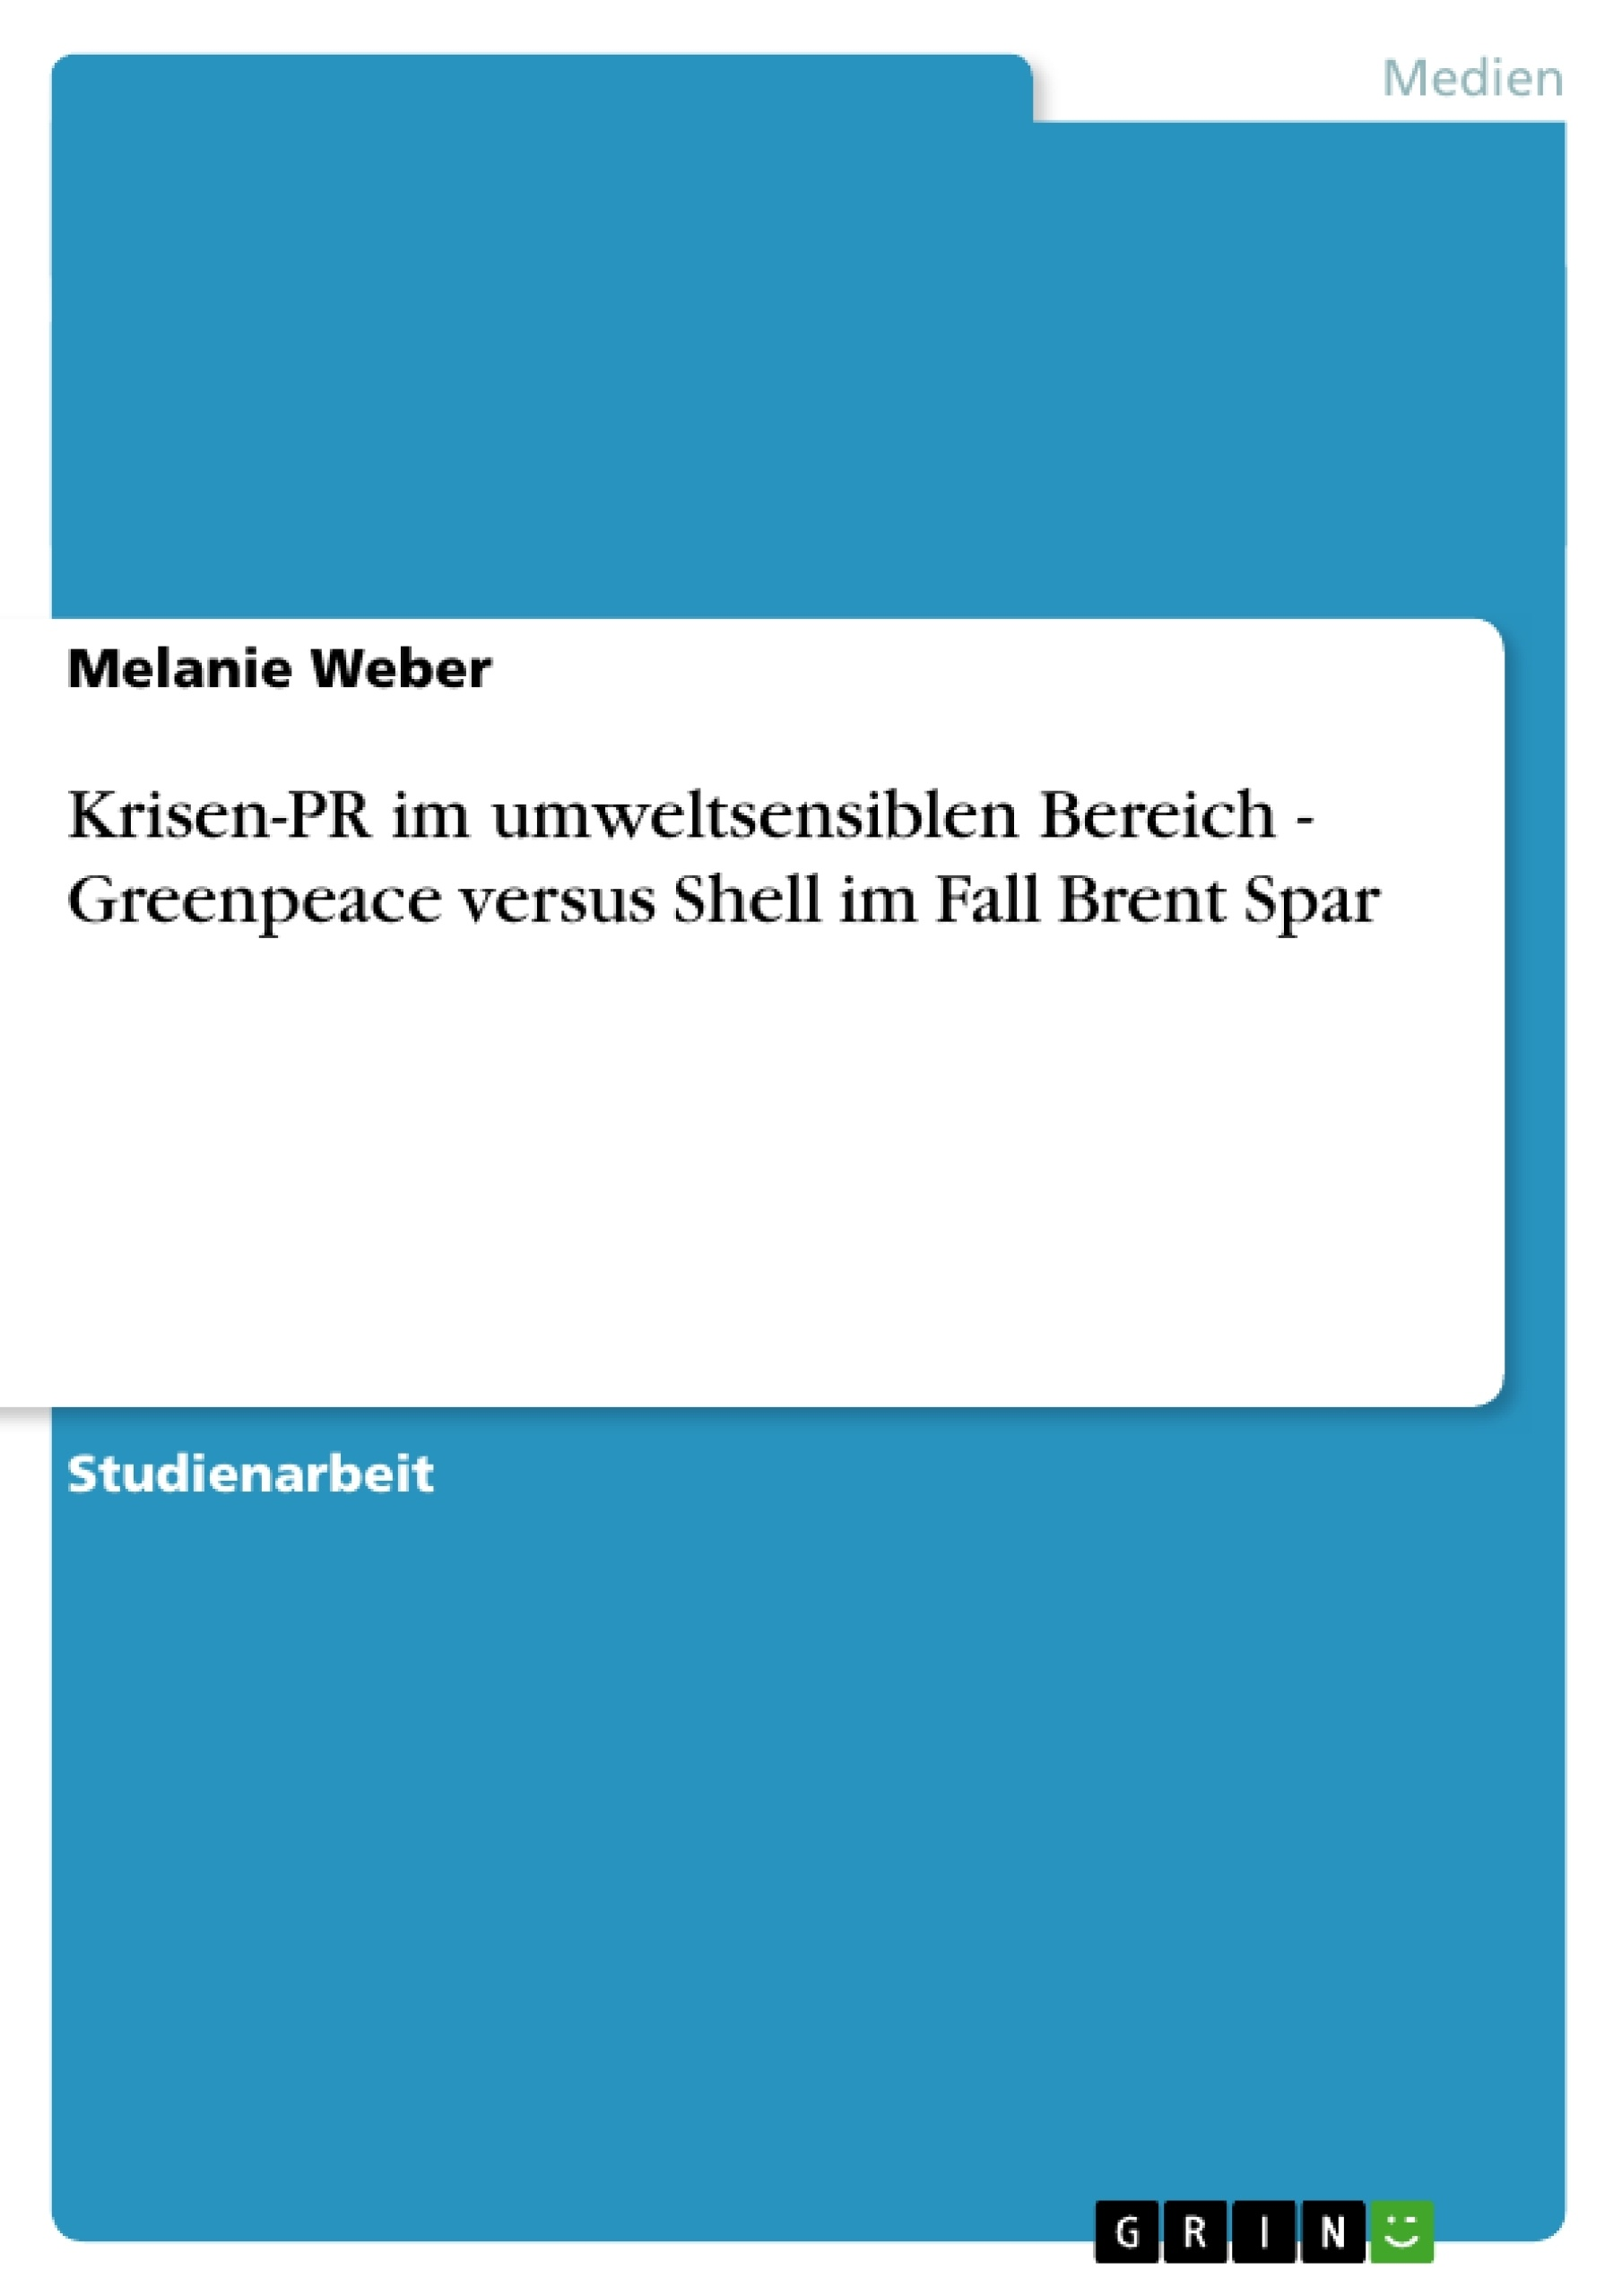 Titel: Krisen-PR im umweltsensiblen Bereich - Greenpeace versus Shell im Fall Brent Spar